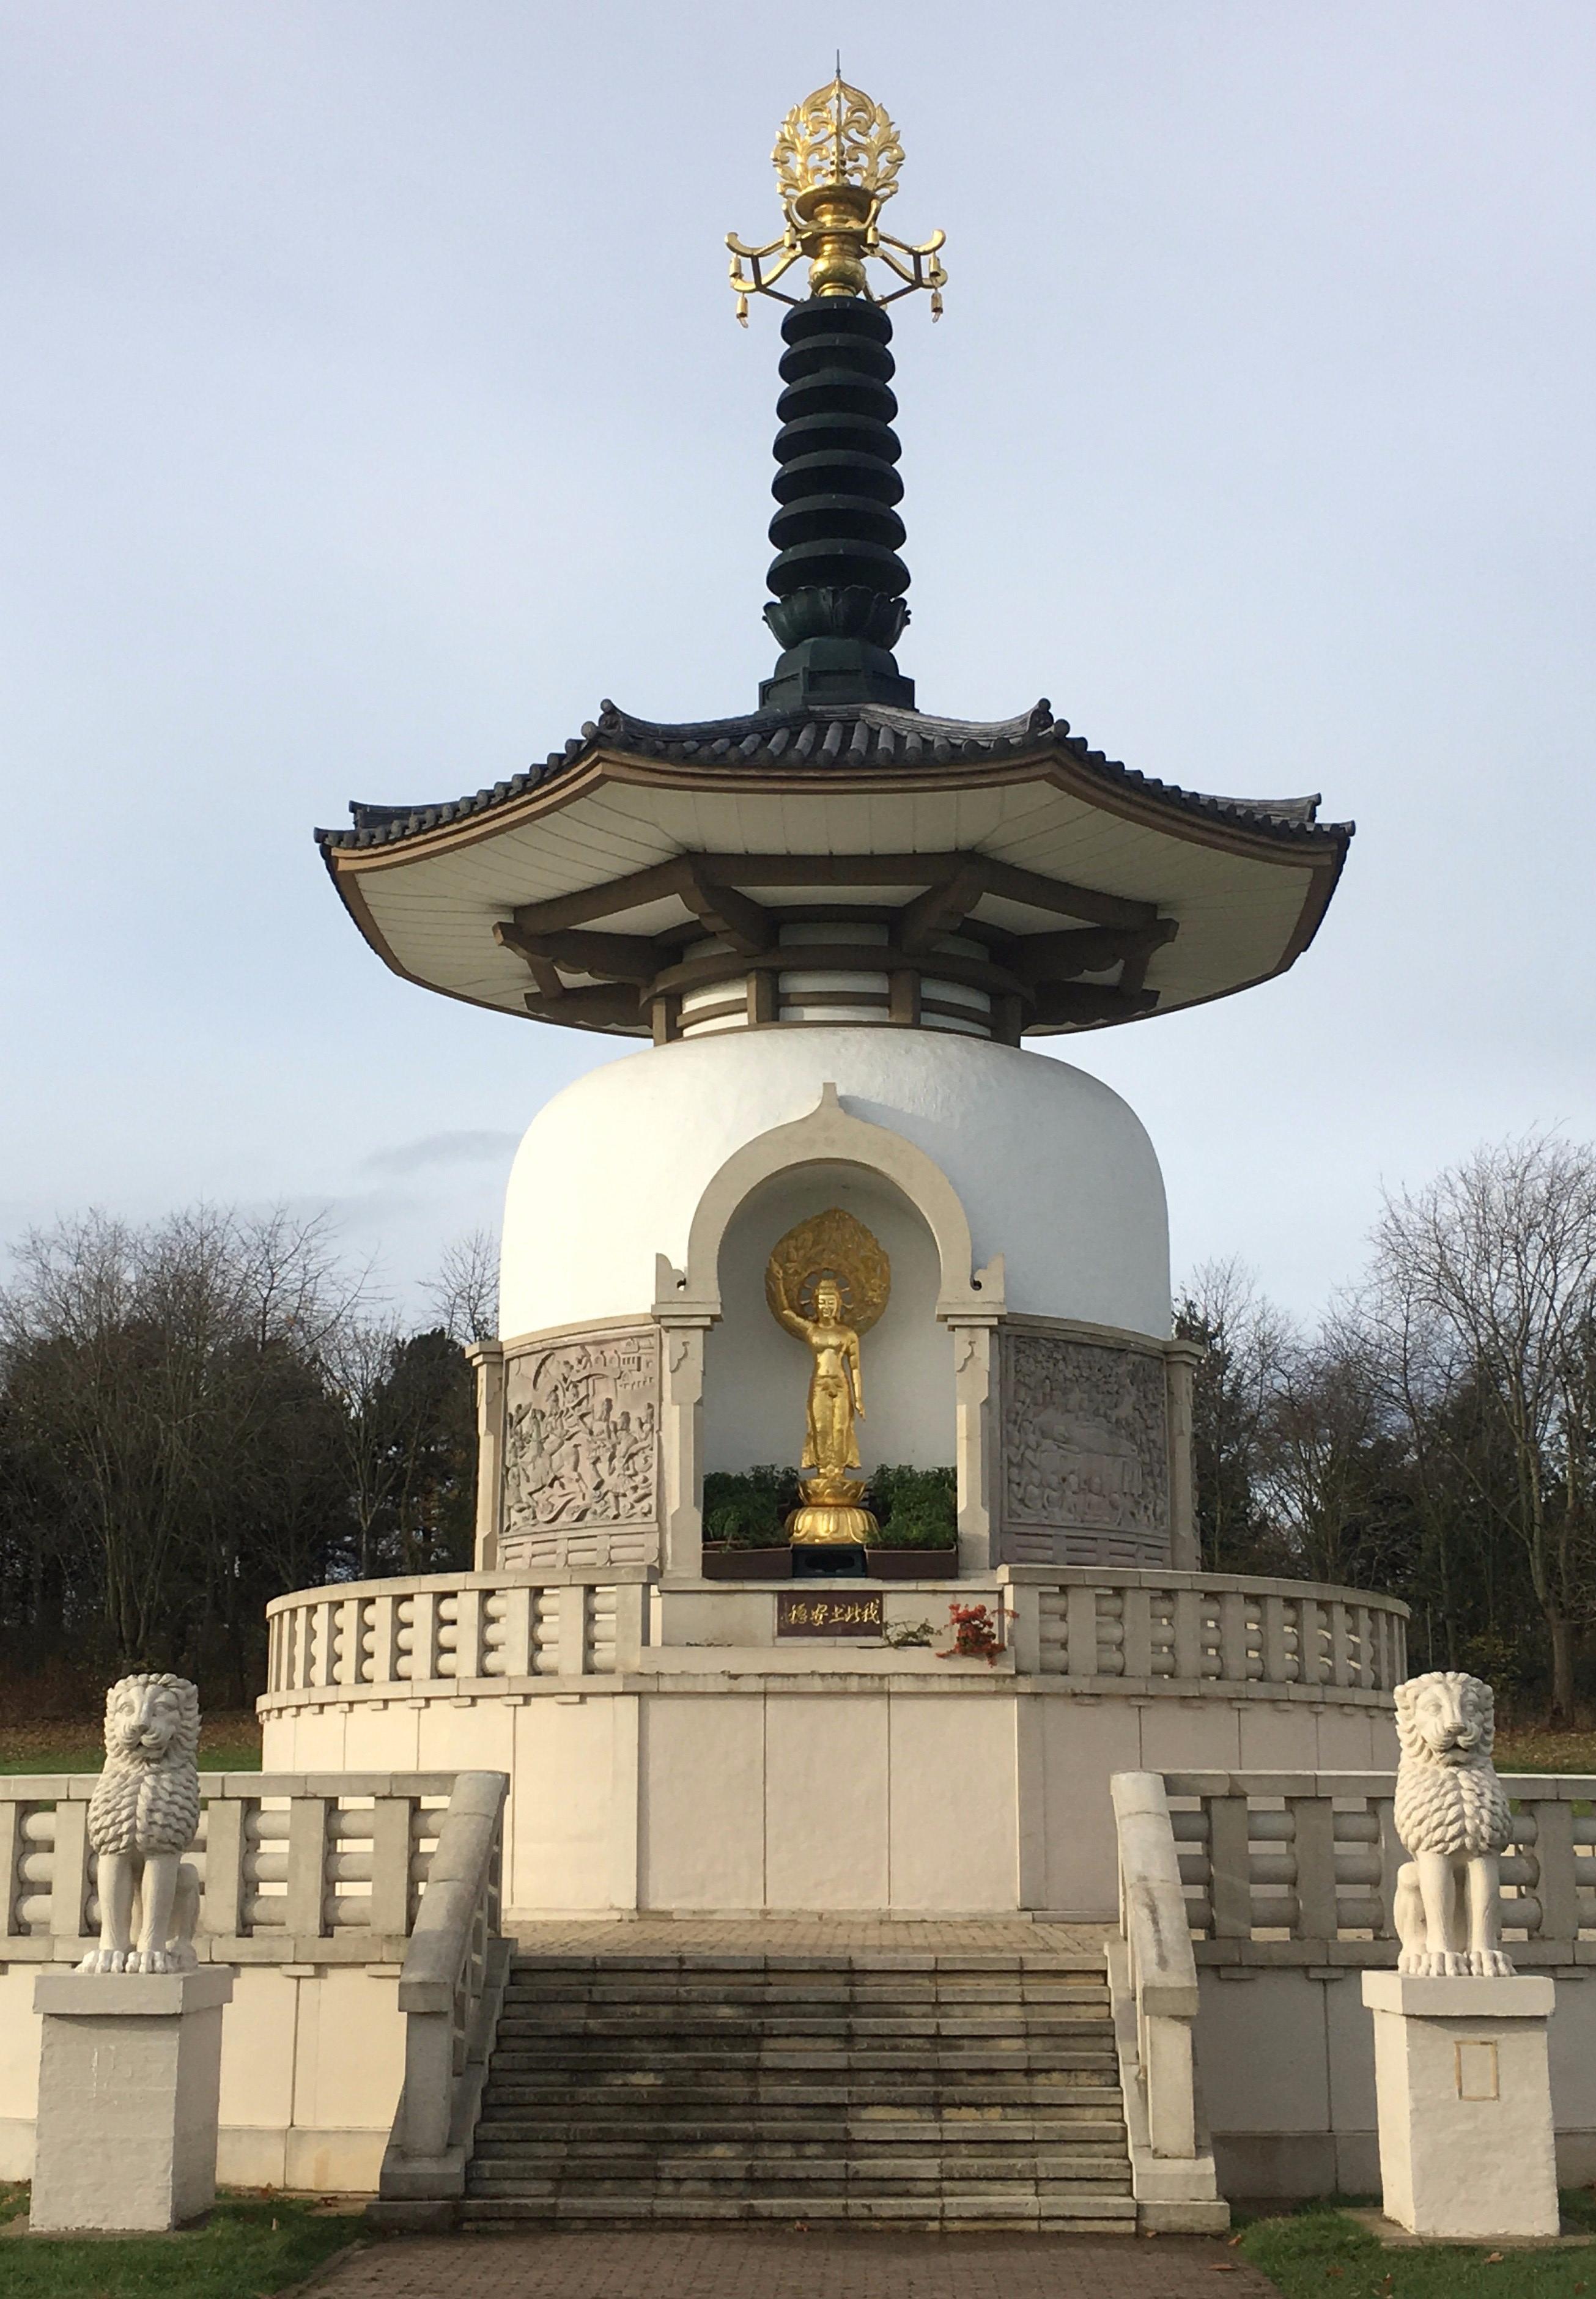 peace-pagoda-with-lions.jpg